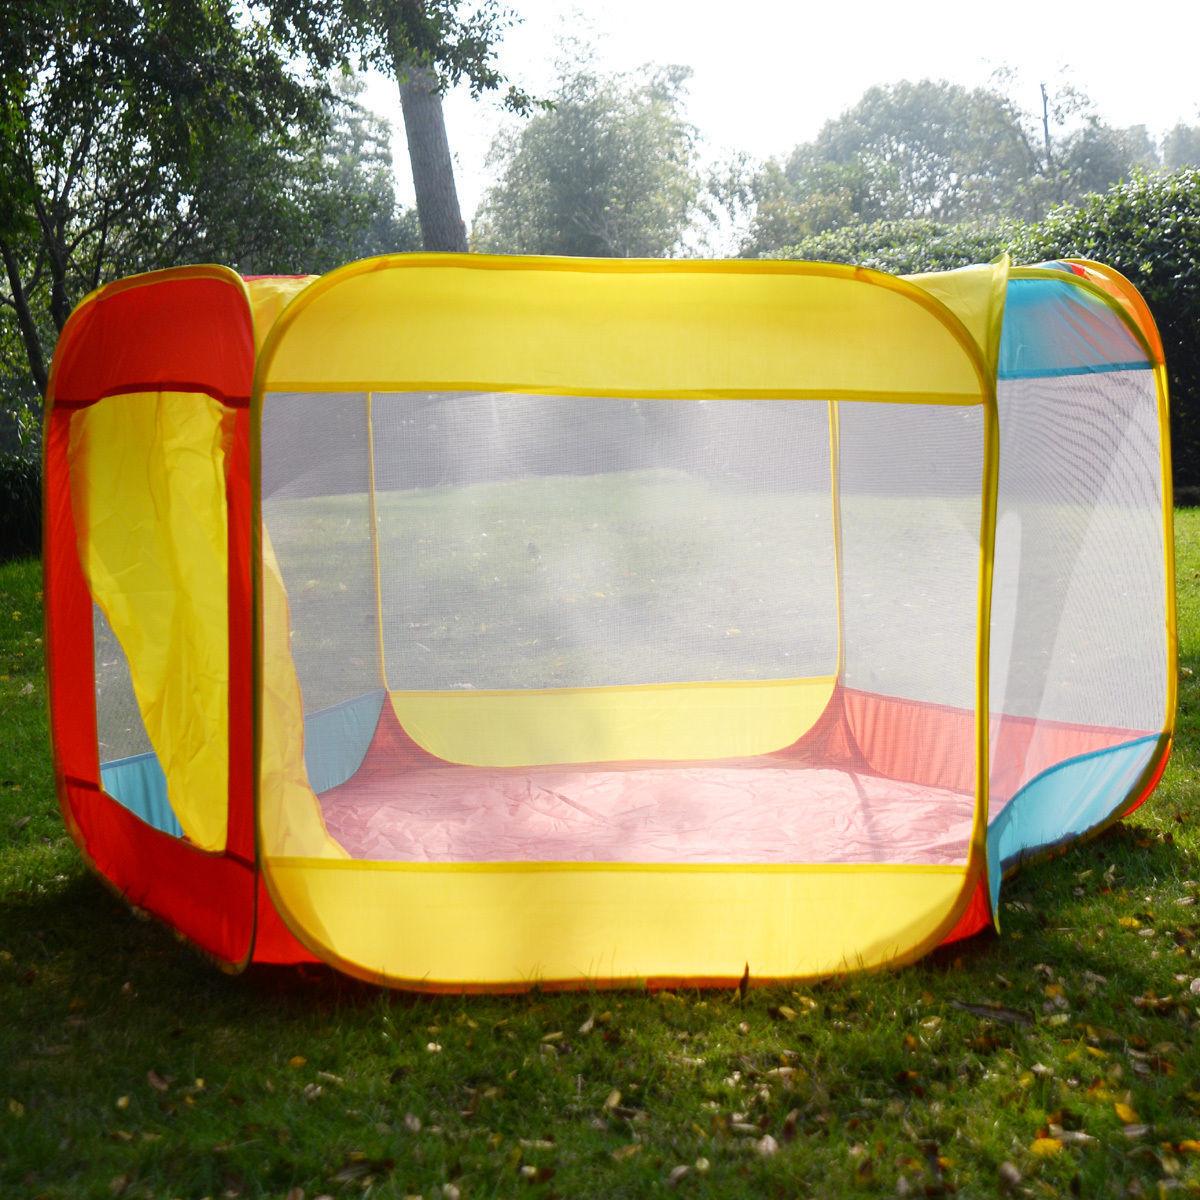 Купить Folding Portable Playpen Baby Play Yard With Travel Bag Indoor Outdoor Safety